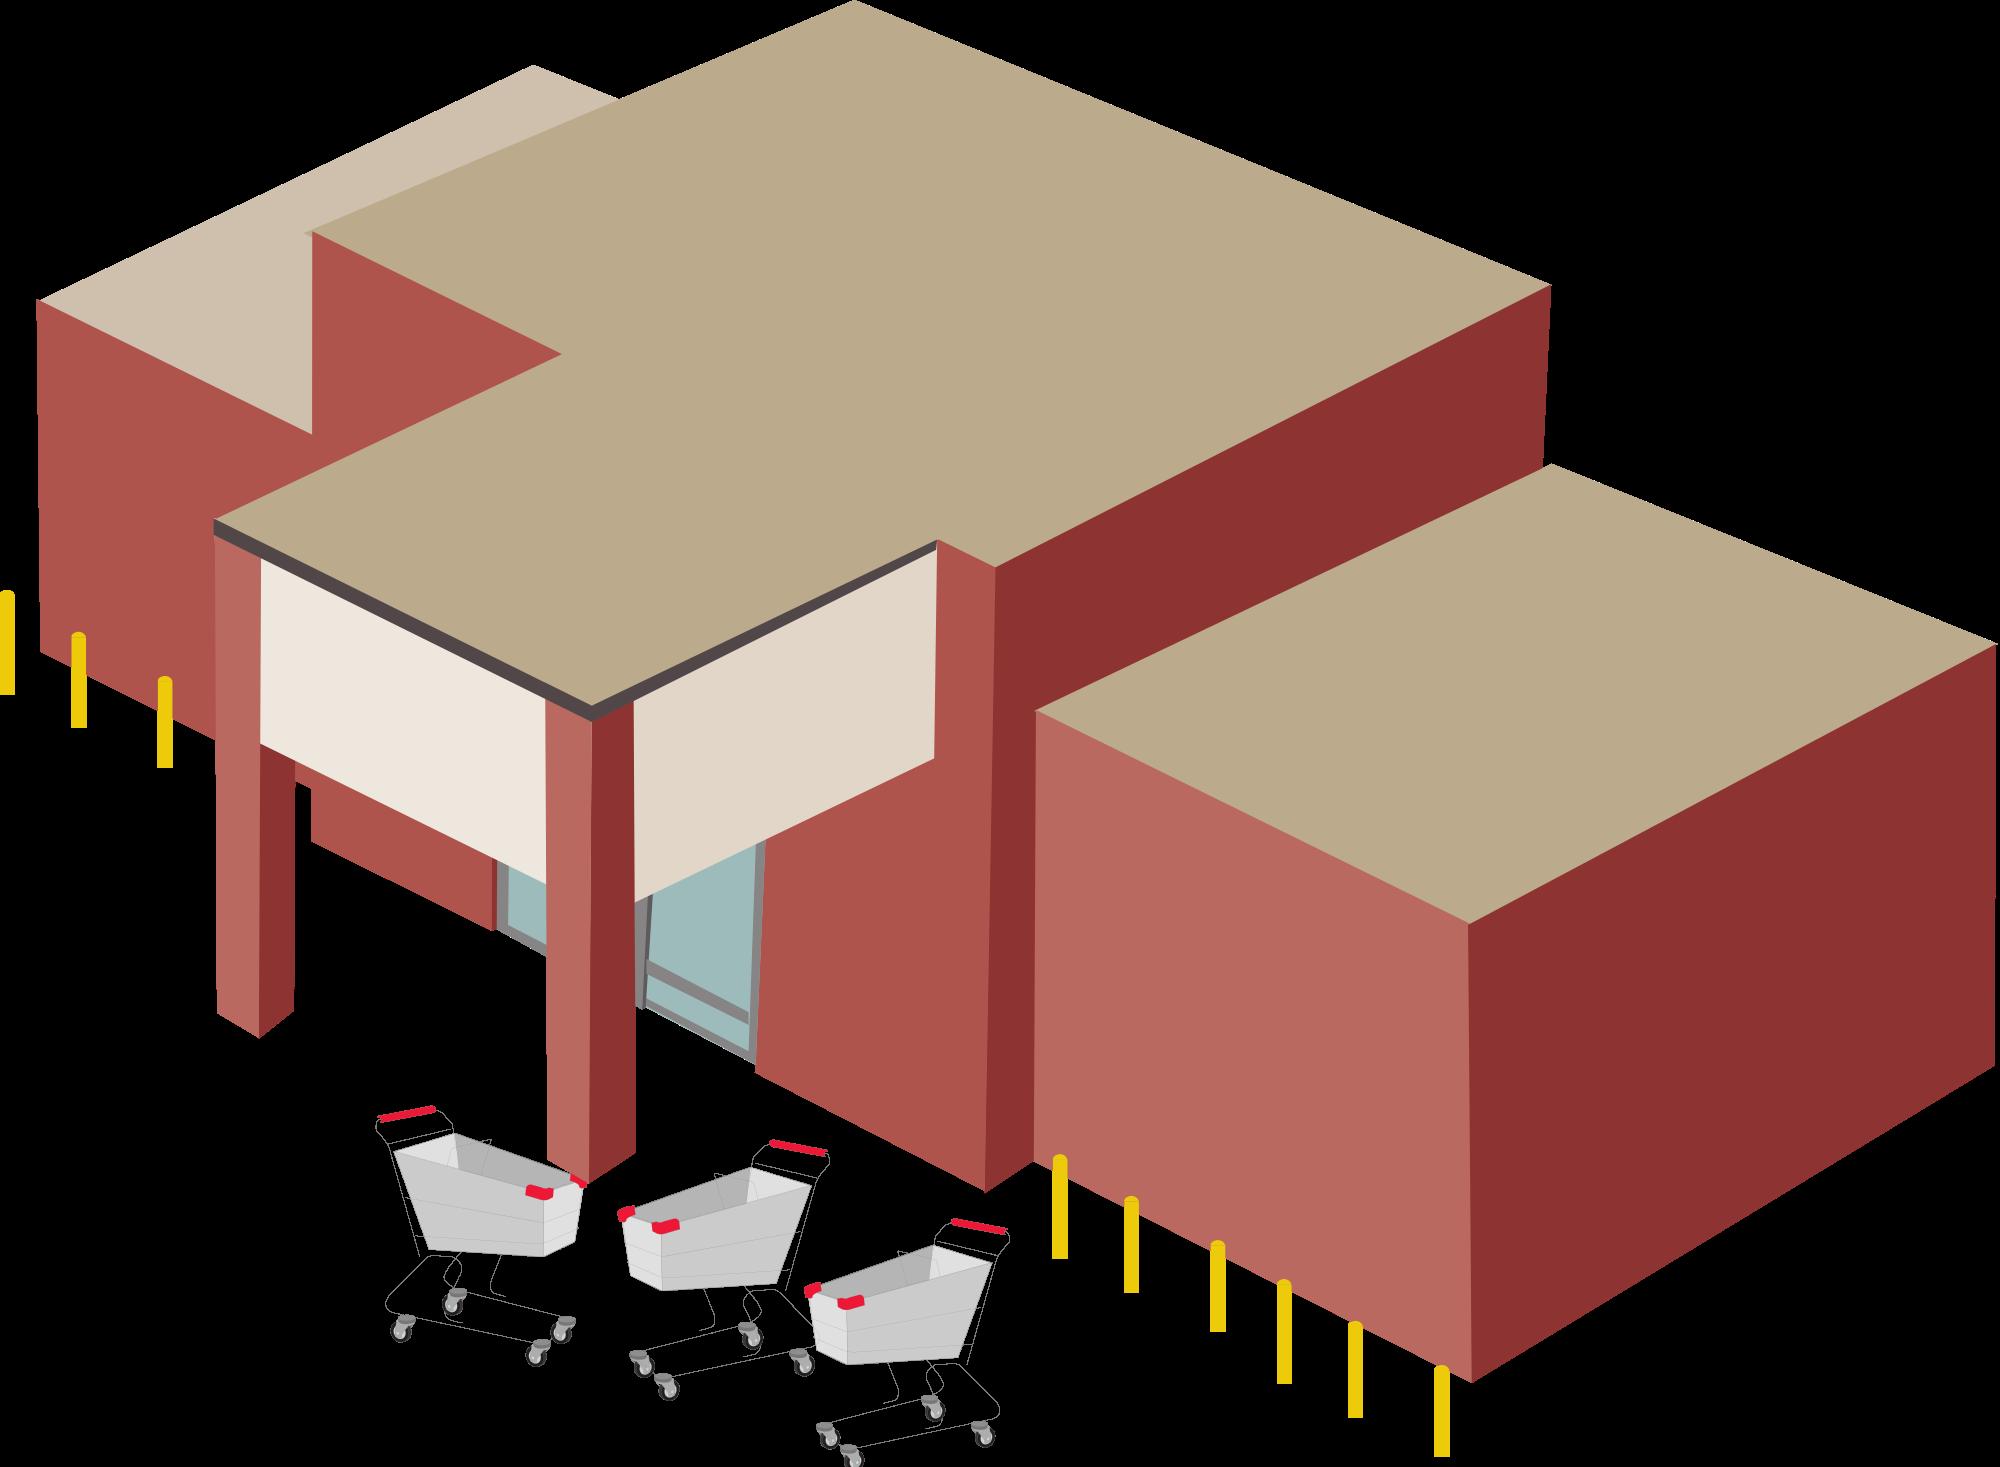 Free Retailer Cliparts Building, Download Free Clip Art.